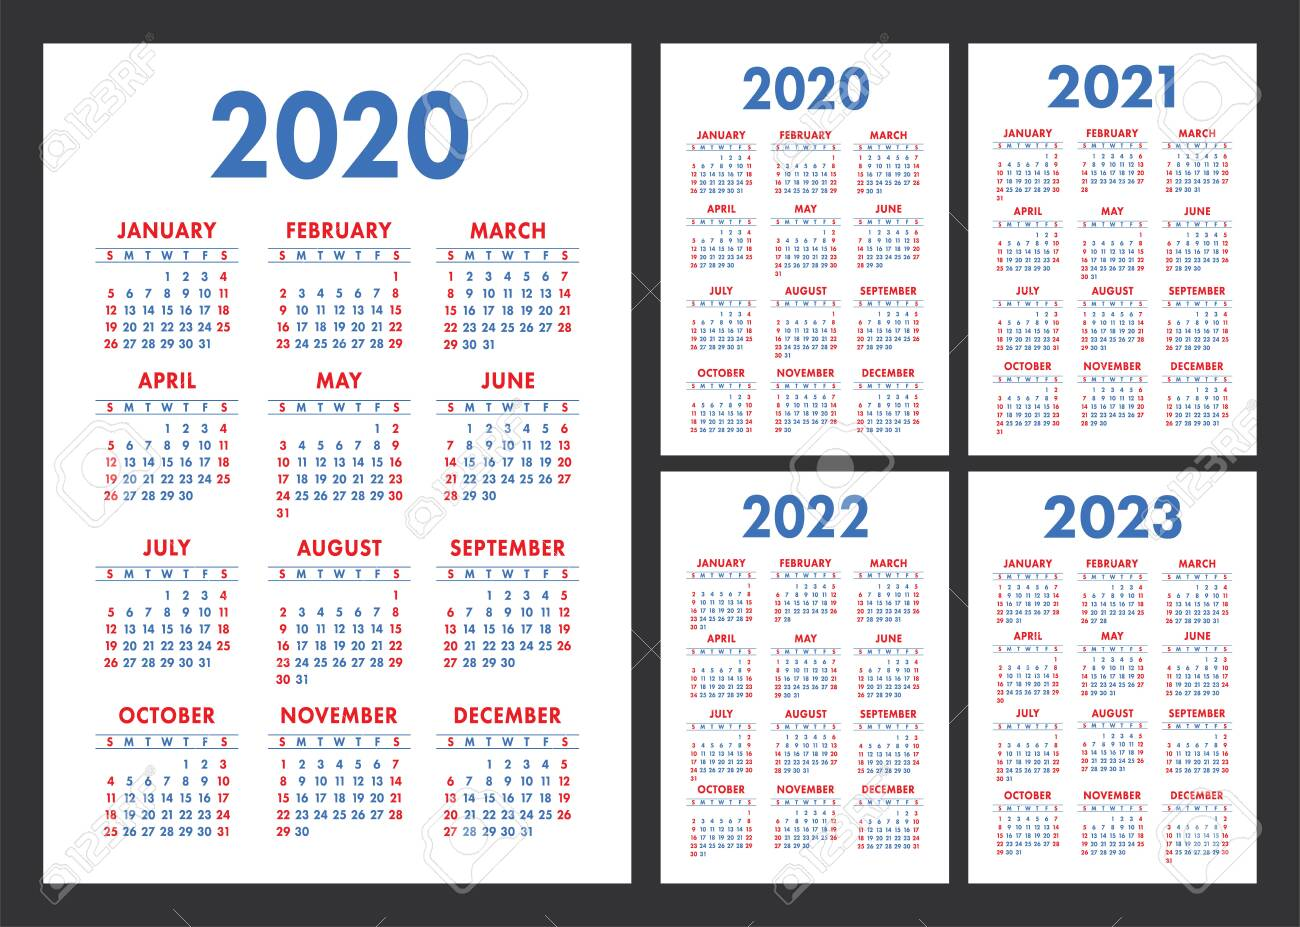 Utk Calendar 2022.Wall Calendar 2021 2022 Academic Calendar